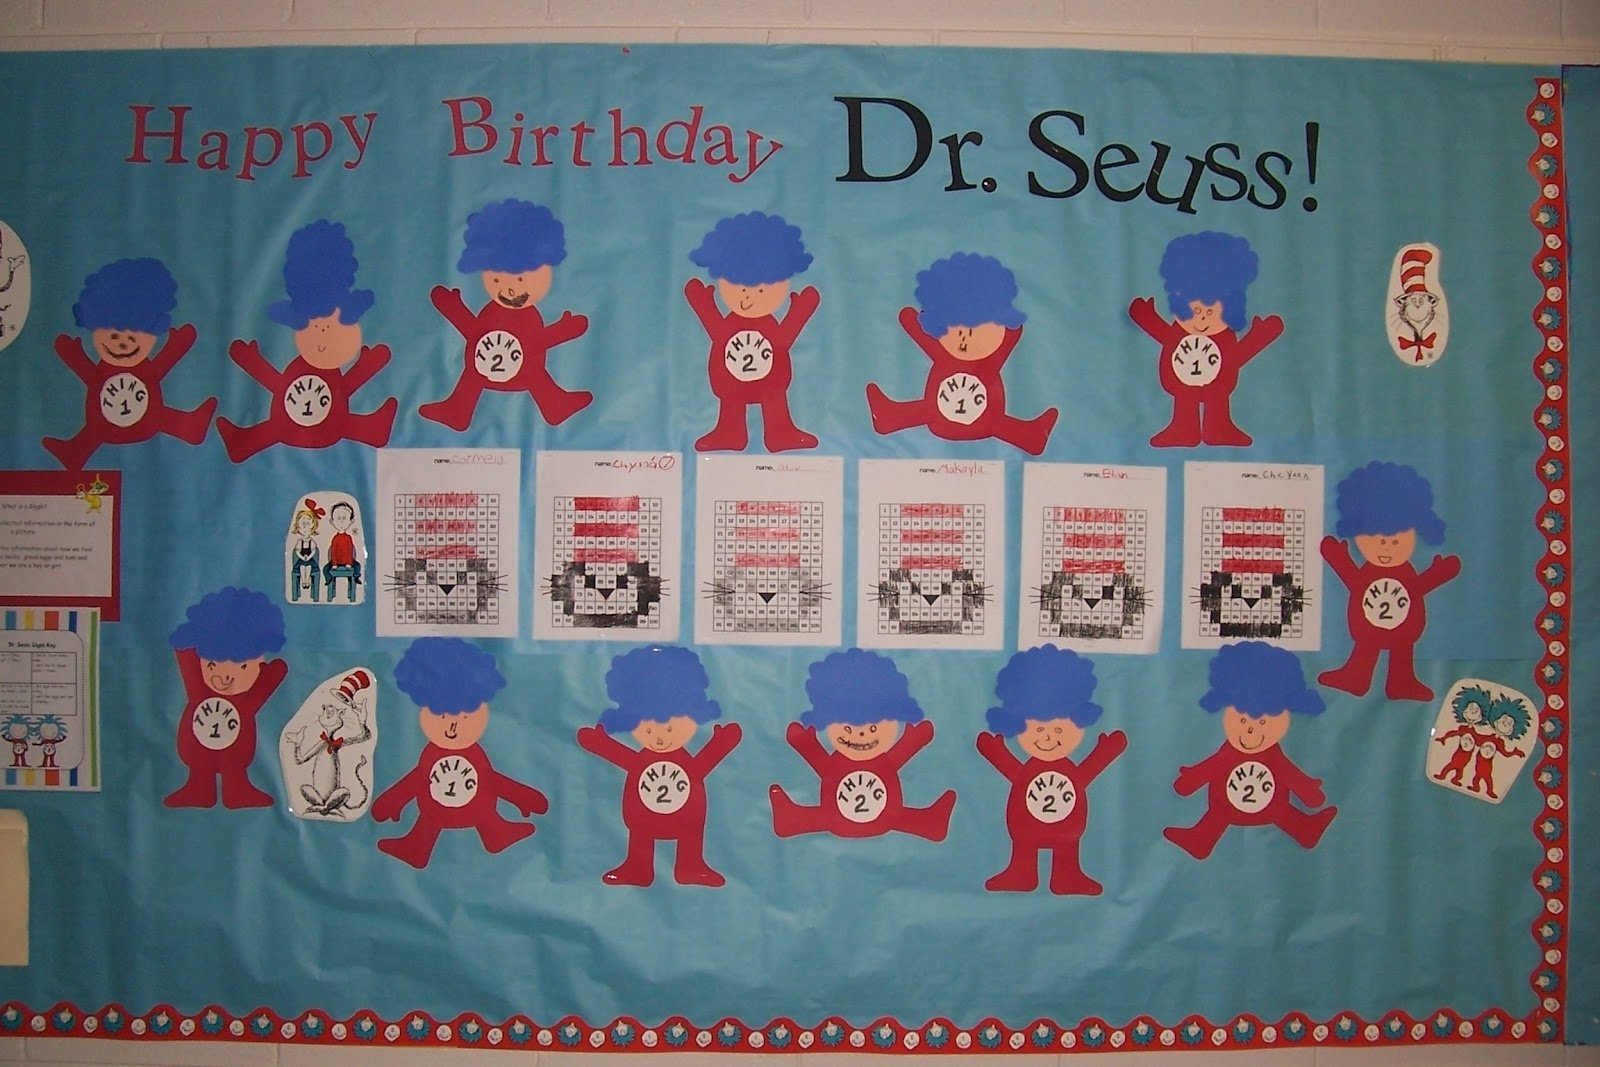 10 Best Dr. Seuss Bulletin Board Ideas For Kindergarten sweet ps class notes i speak for the trees 2021